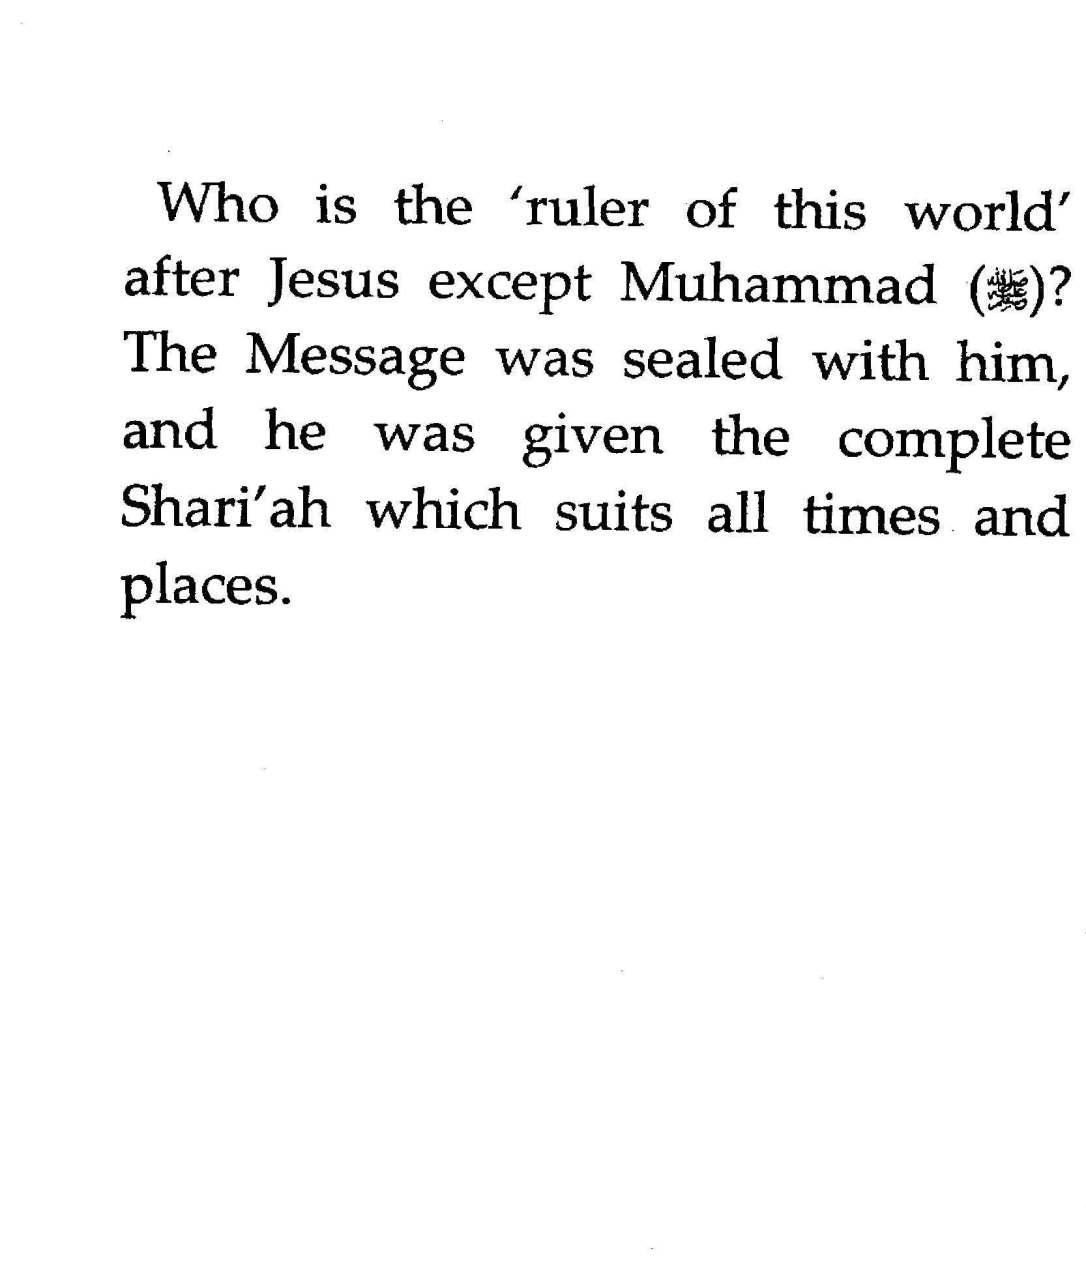 MuhammadpeaceBeUponHimInTheTorahAndGospel_Page_27